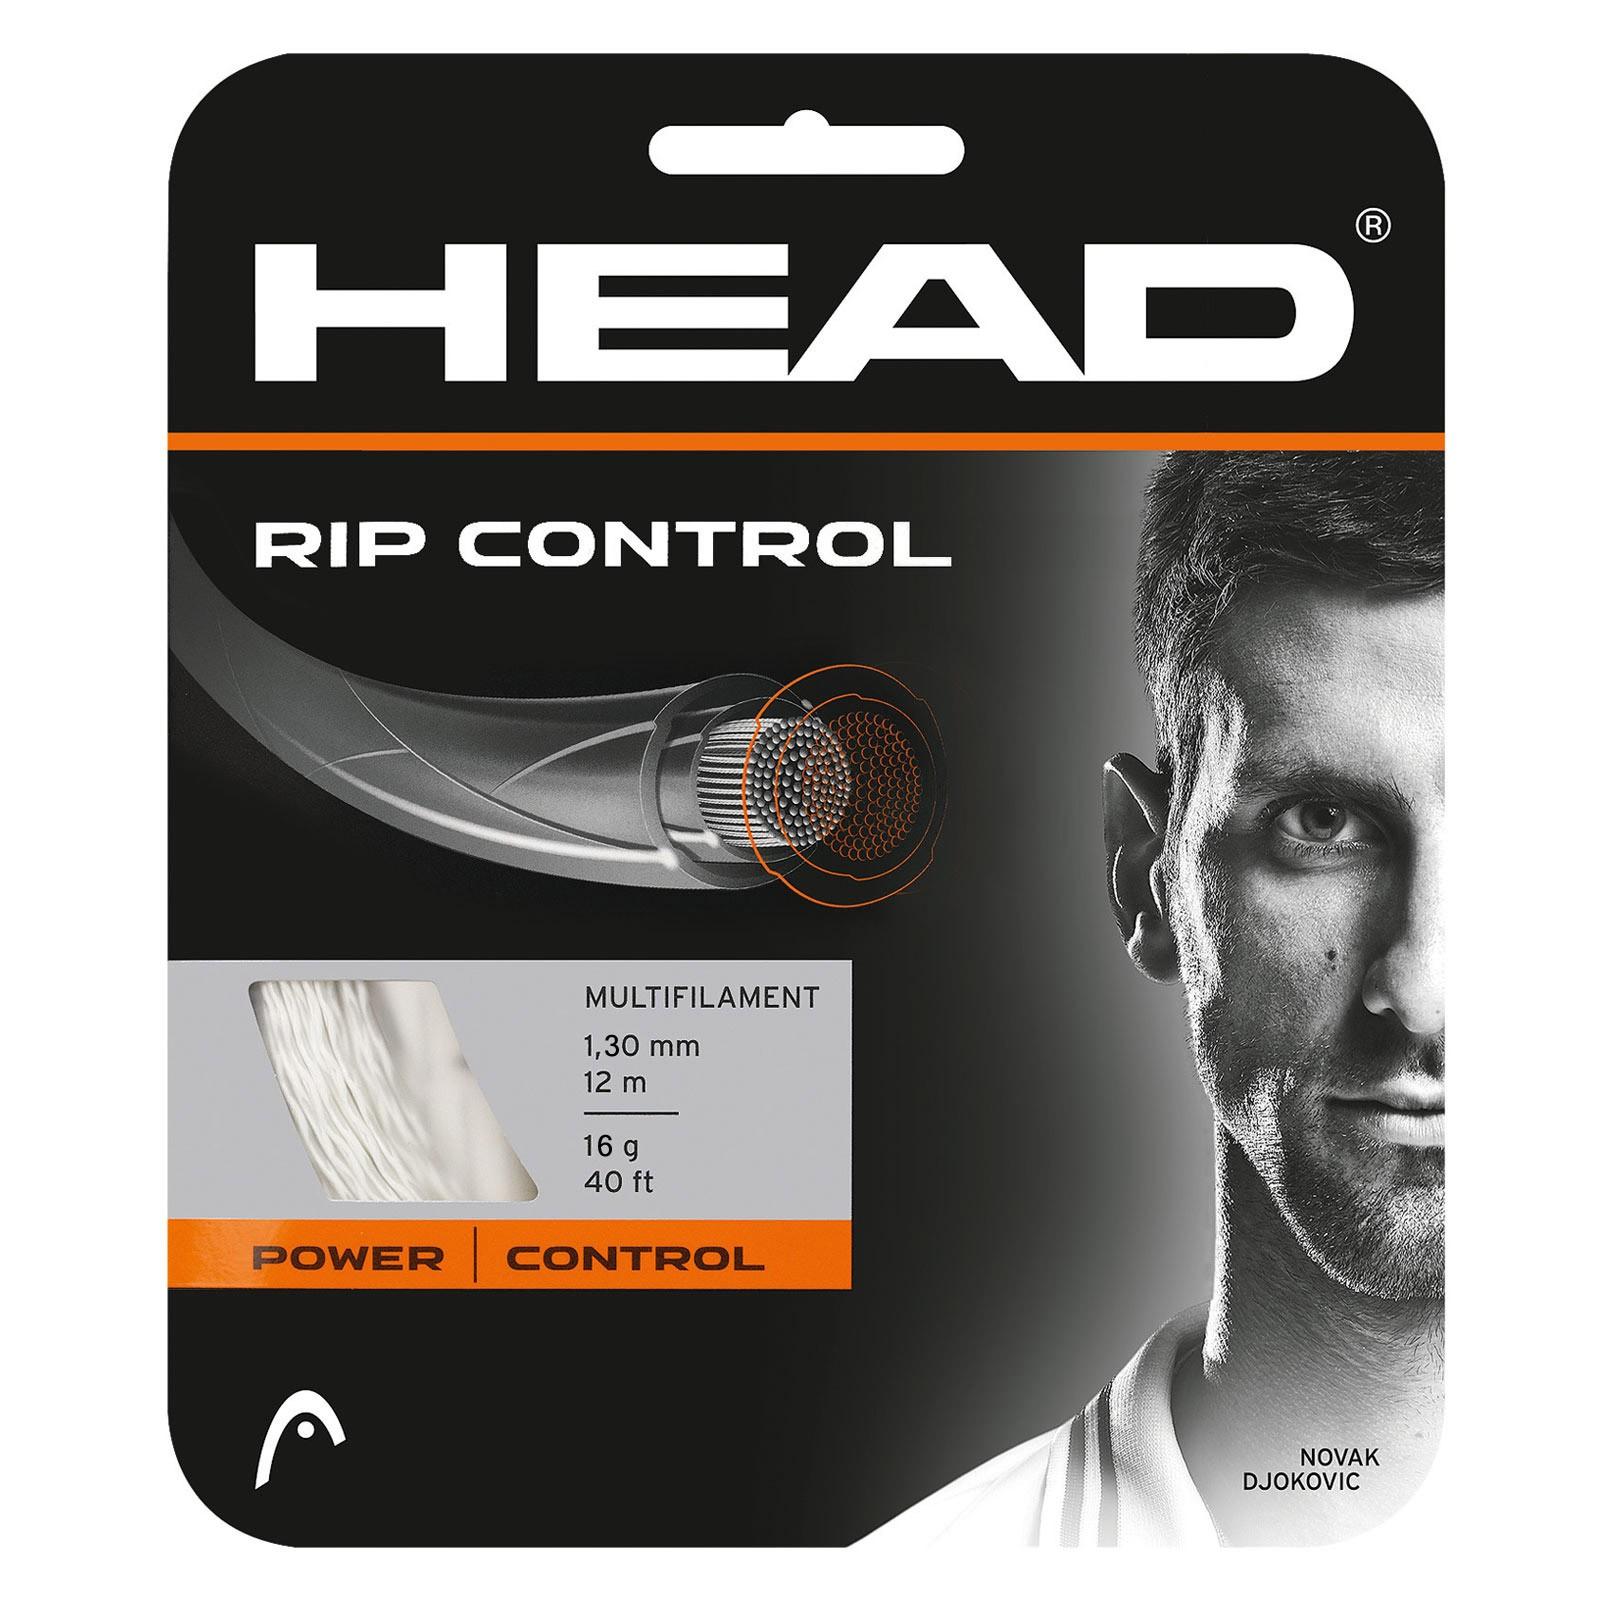 HEAD RIP CONTROL 12M